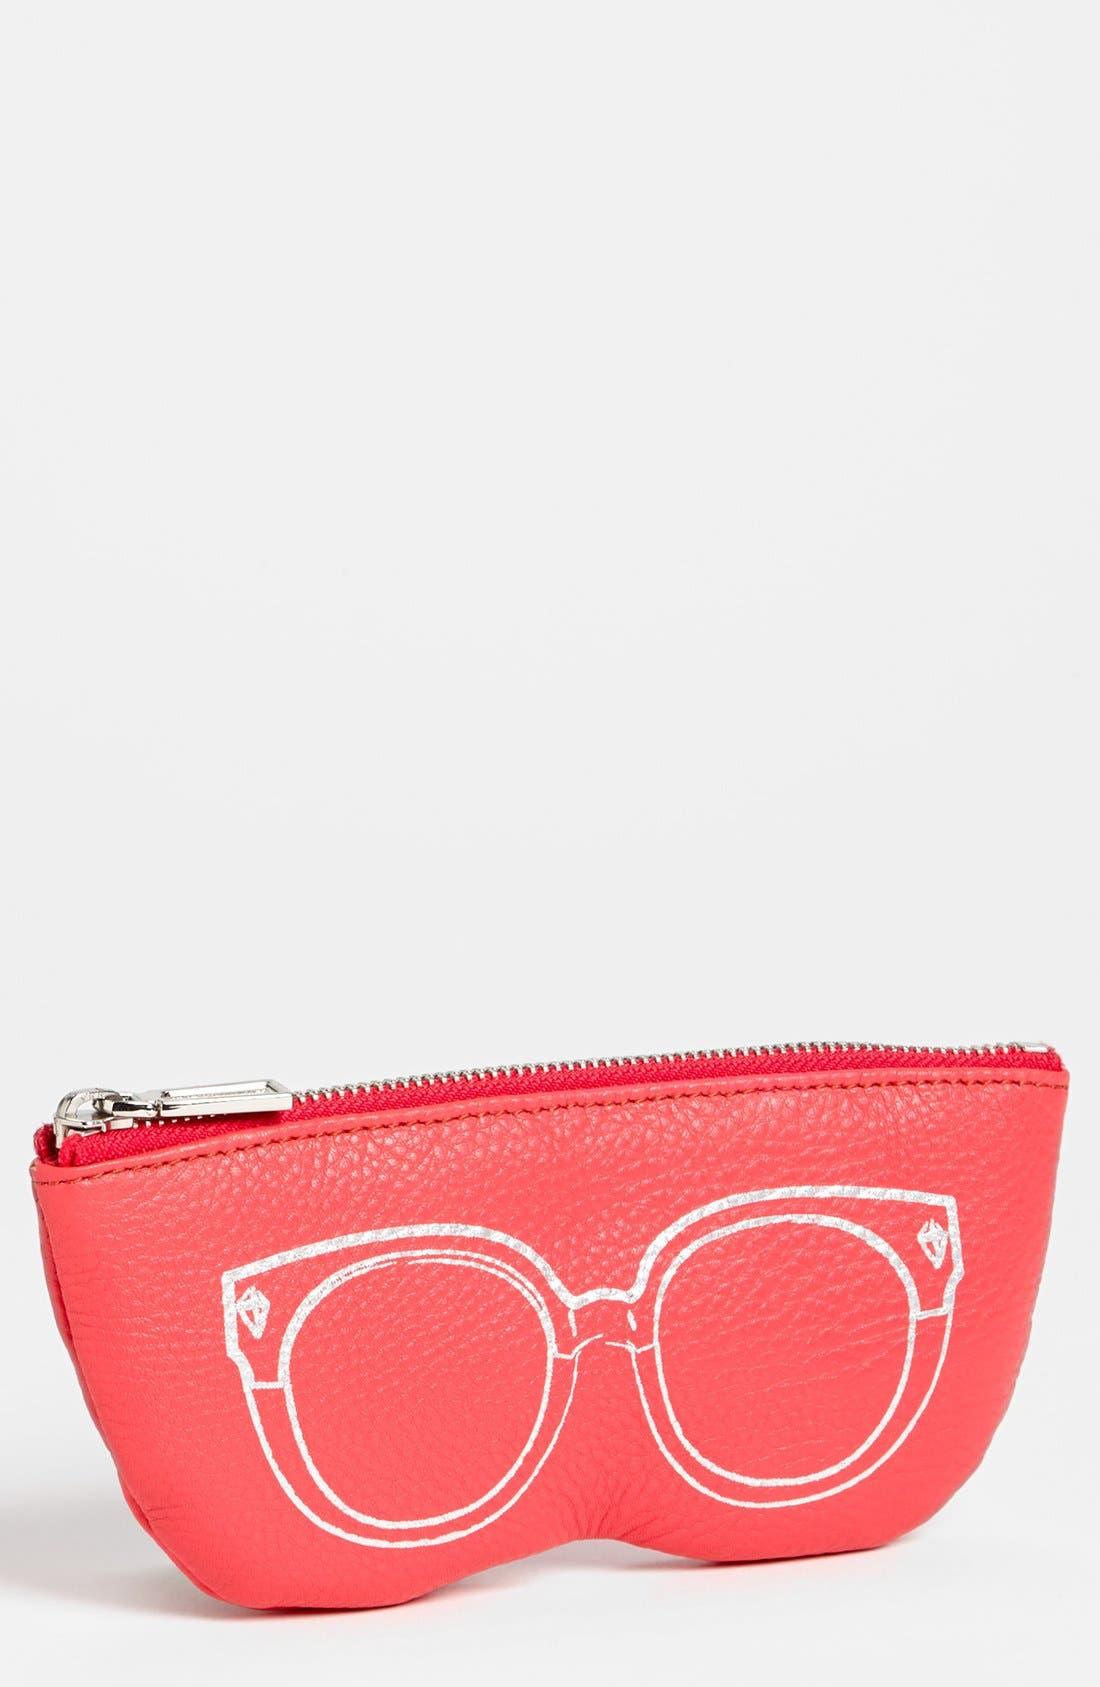 Alternate Image 1 Selected - Rebecca Minkoff Leather Sunglasses Case